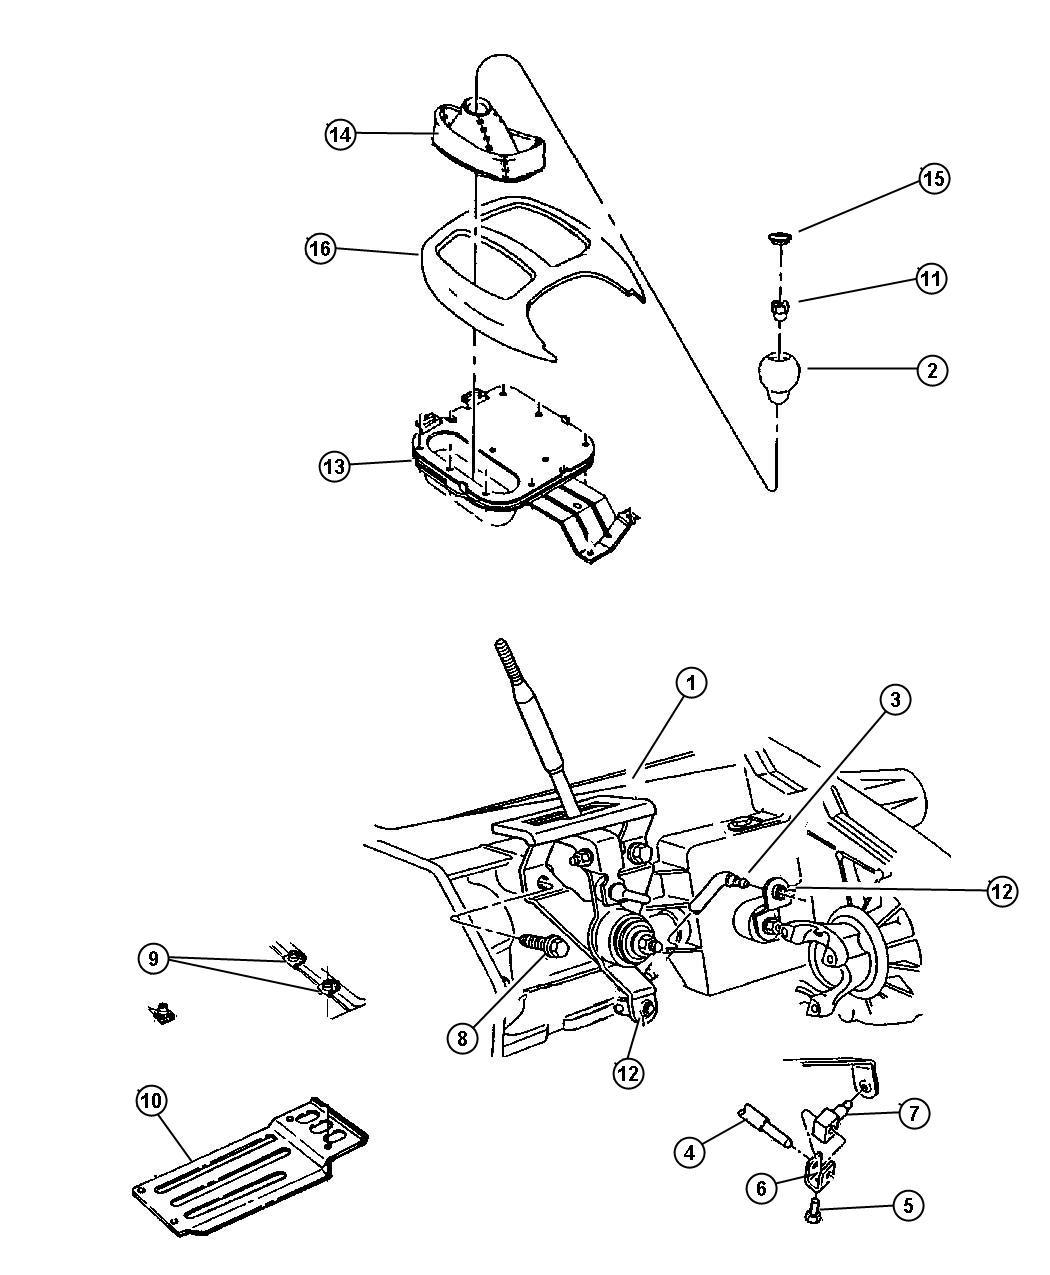 Dodge Dakota Rod Gear Shift Control Transfer Case